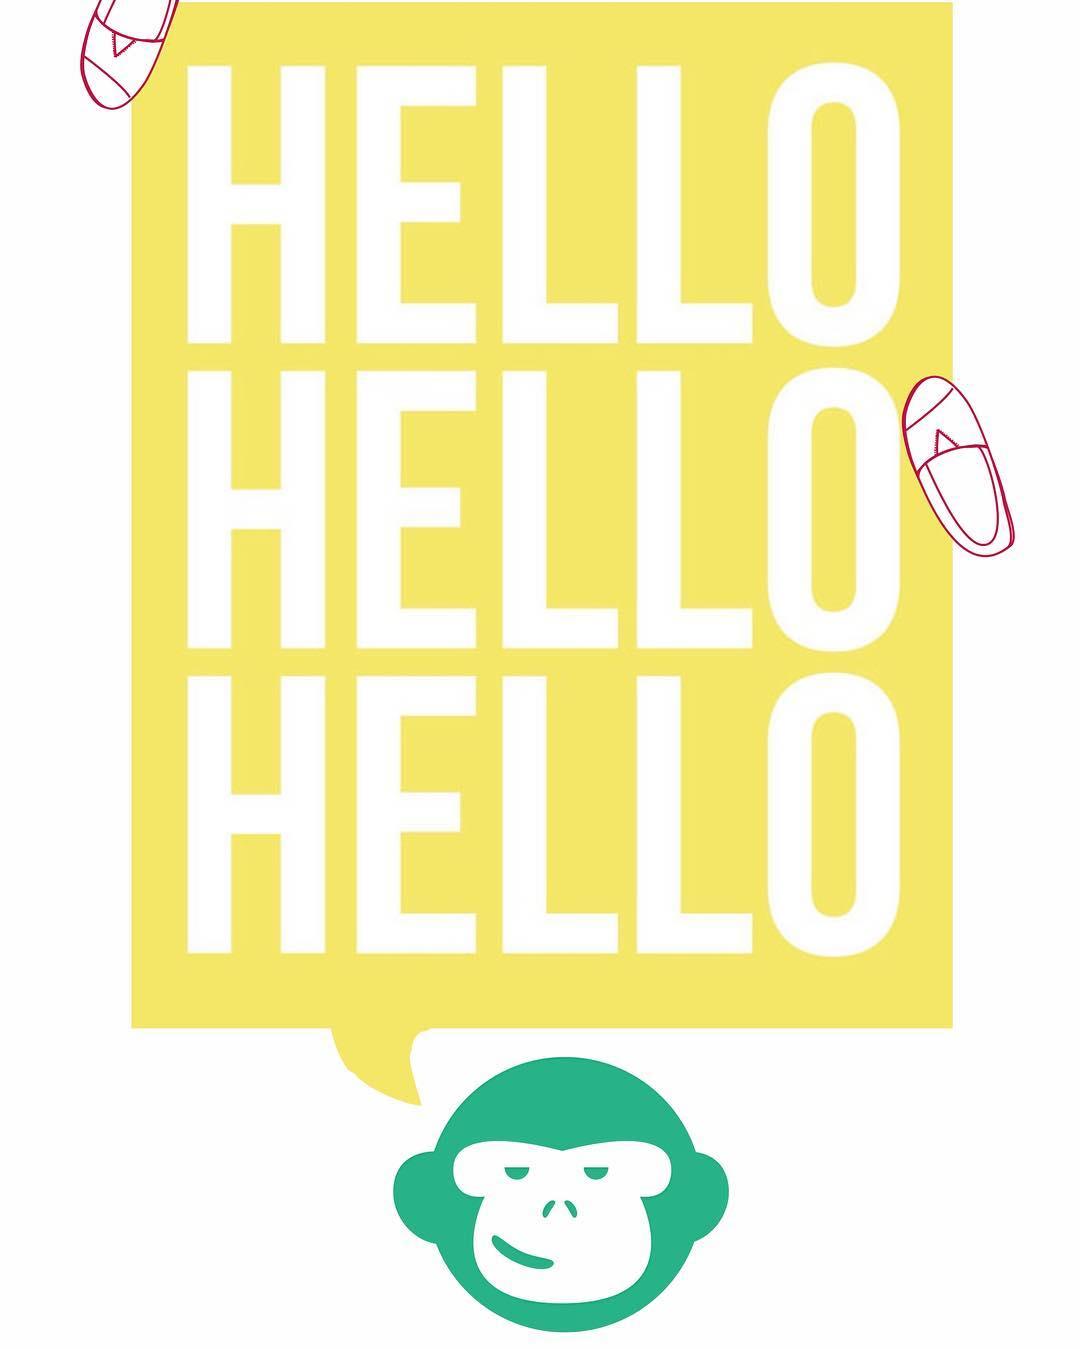 Hello Friday!! @blackmonkeystore #alpargatas #calzado #handame #argentina #gorros #cap #design #fashion #style #colors #free #monkeybrands #friday #summer #verano #febrero #viernes #picoftheday #photooftheday #hello #hola #summertime #alpargata  #live...